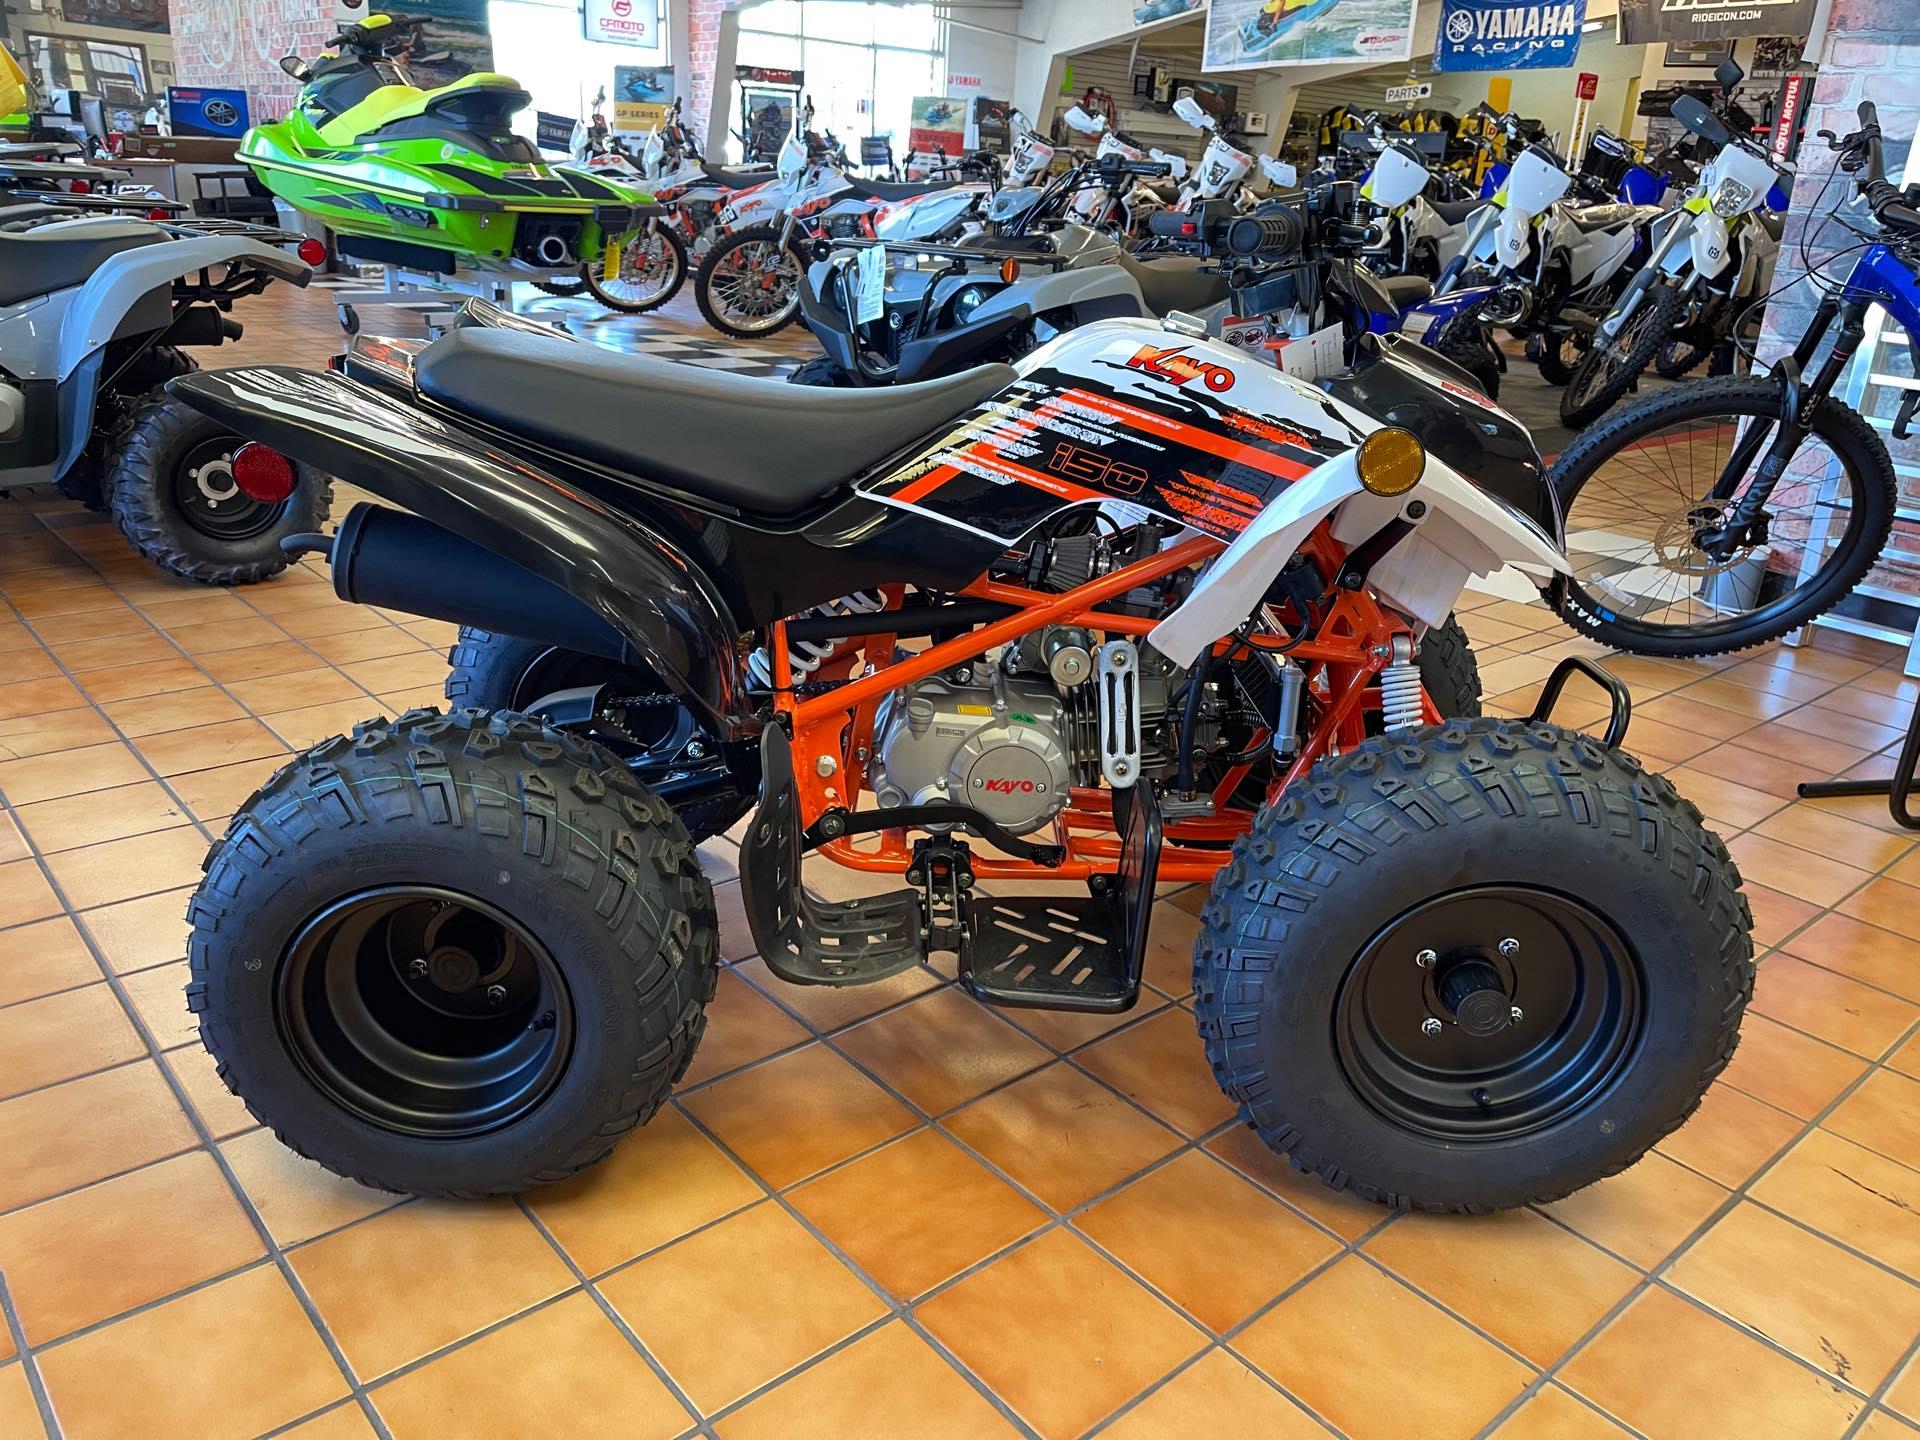 2021 Kayo STORM 150 at Bobby J's Yamaha, Albuquerque, NM 87110